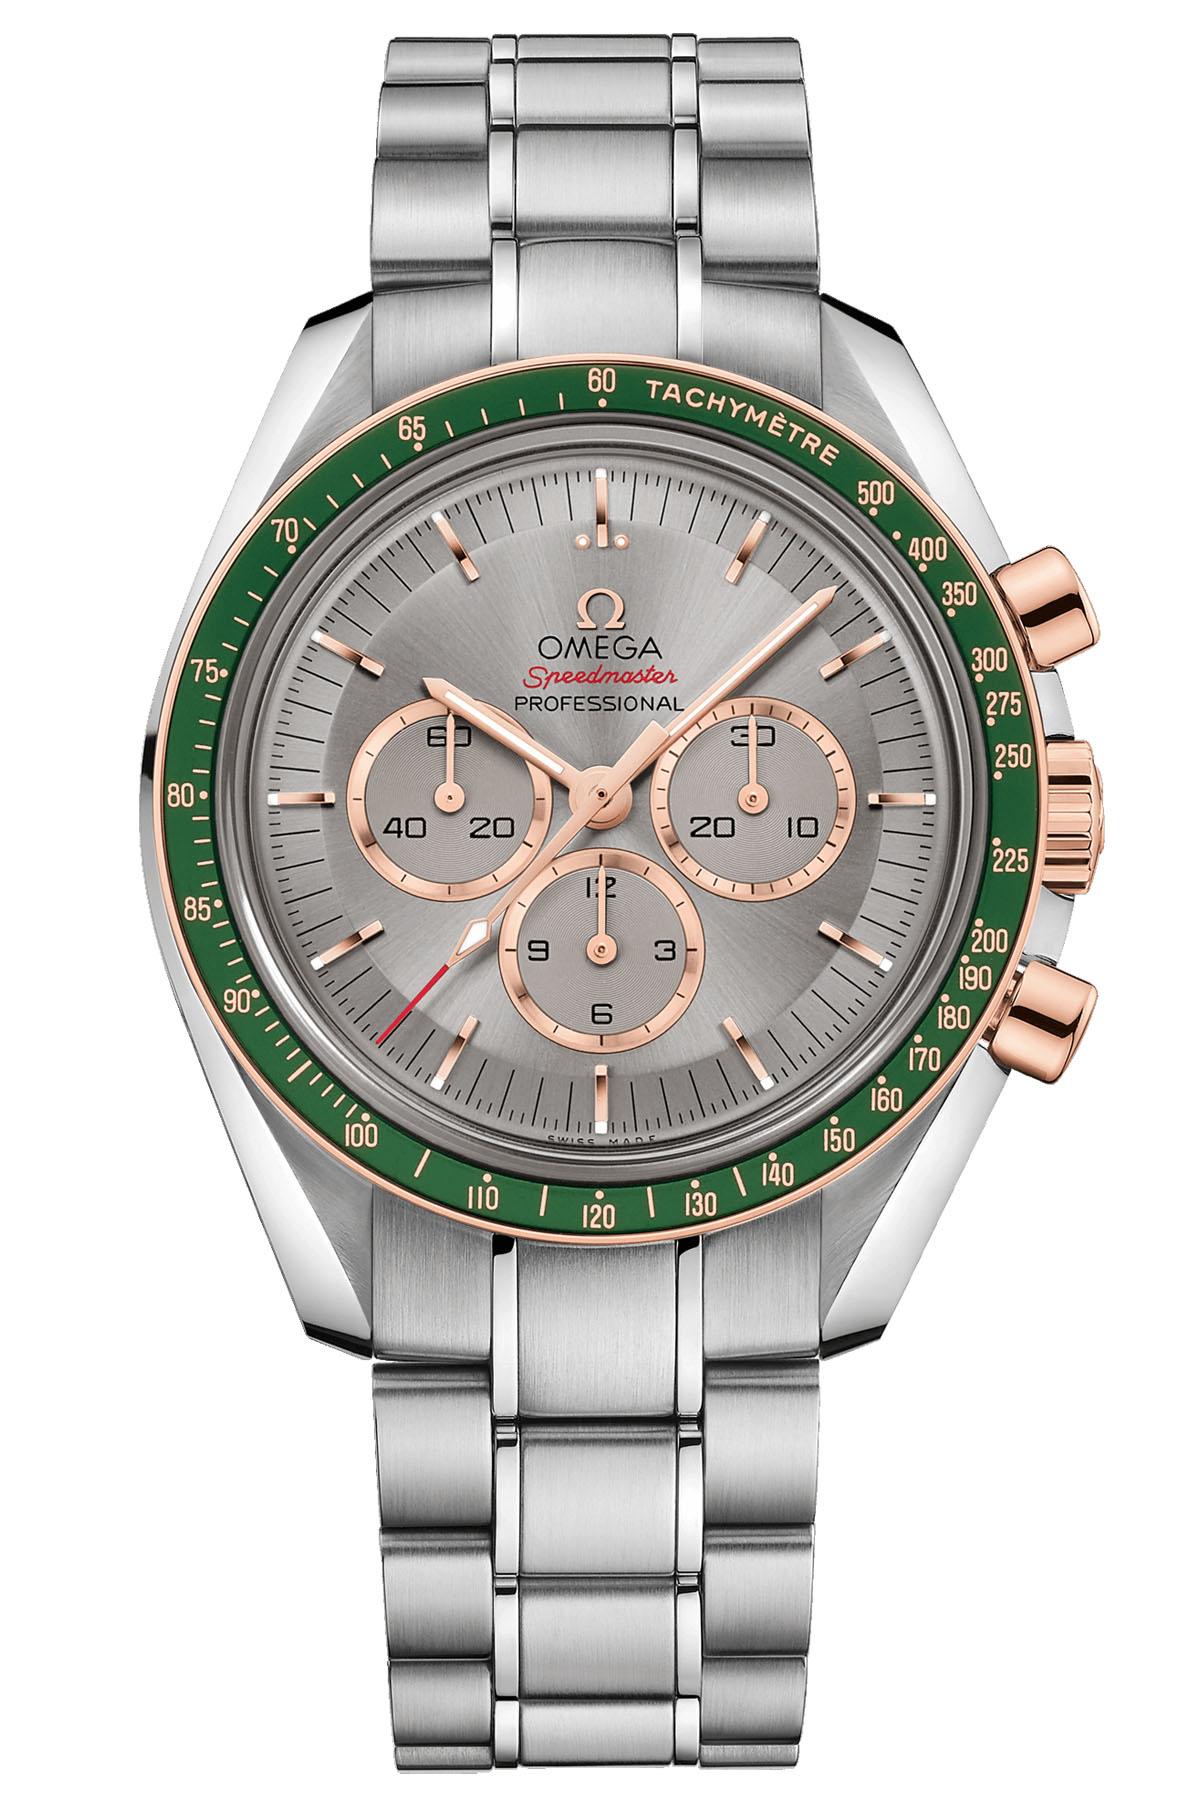 Omega Speedmaster Tokyo 2020 Olympics collection 52220423006001